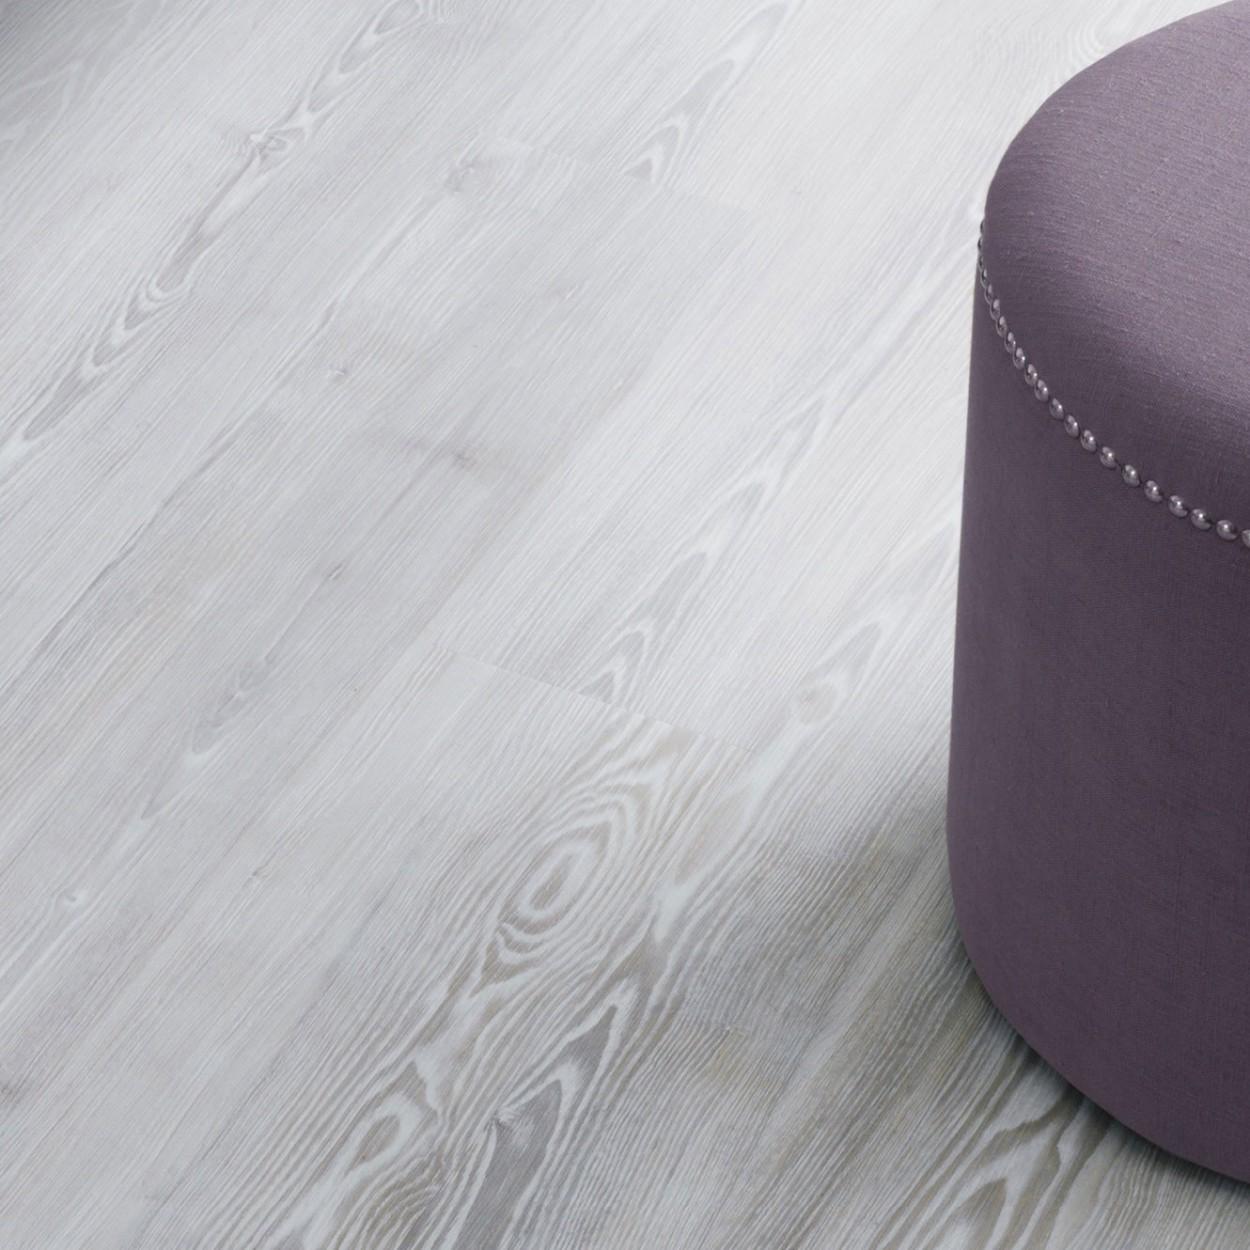 Amtico Spacia White Ash Flooring, White Ash Laminate Flooring